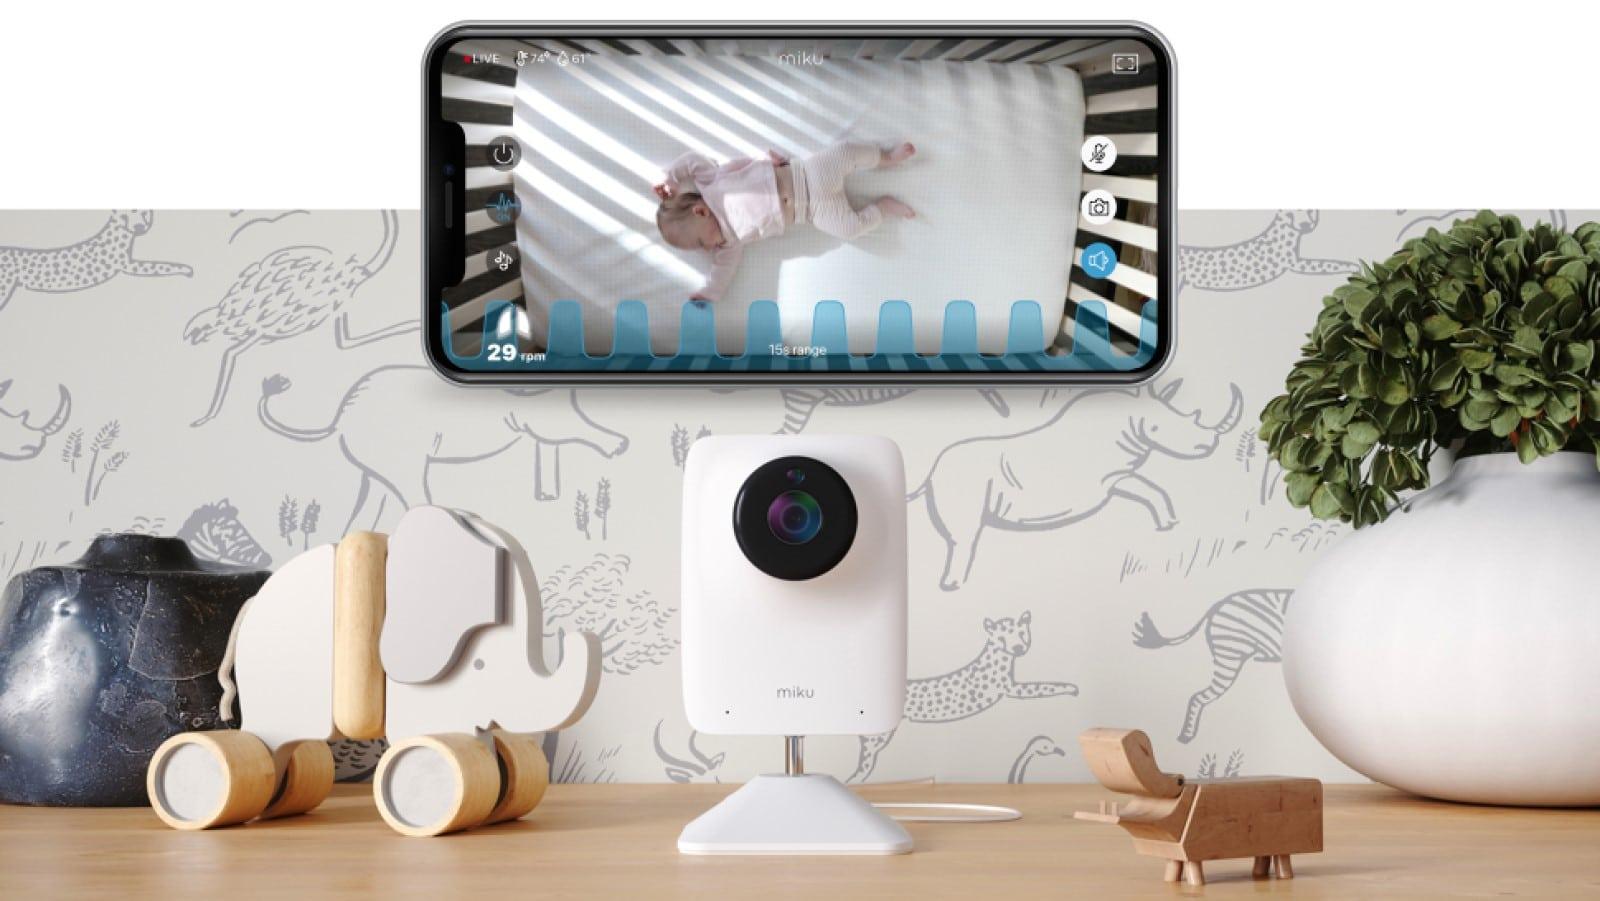 miku baby monitors